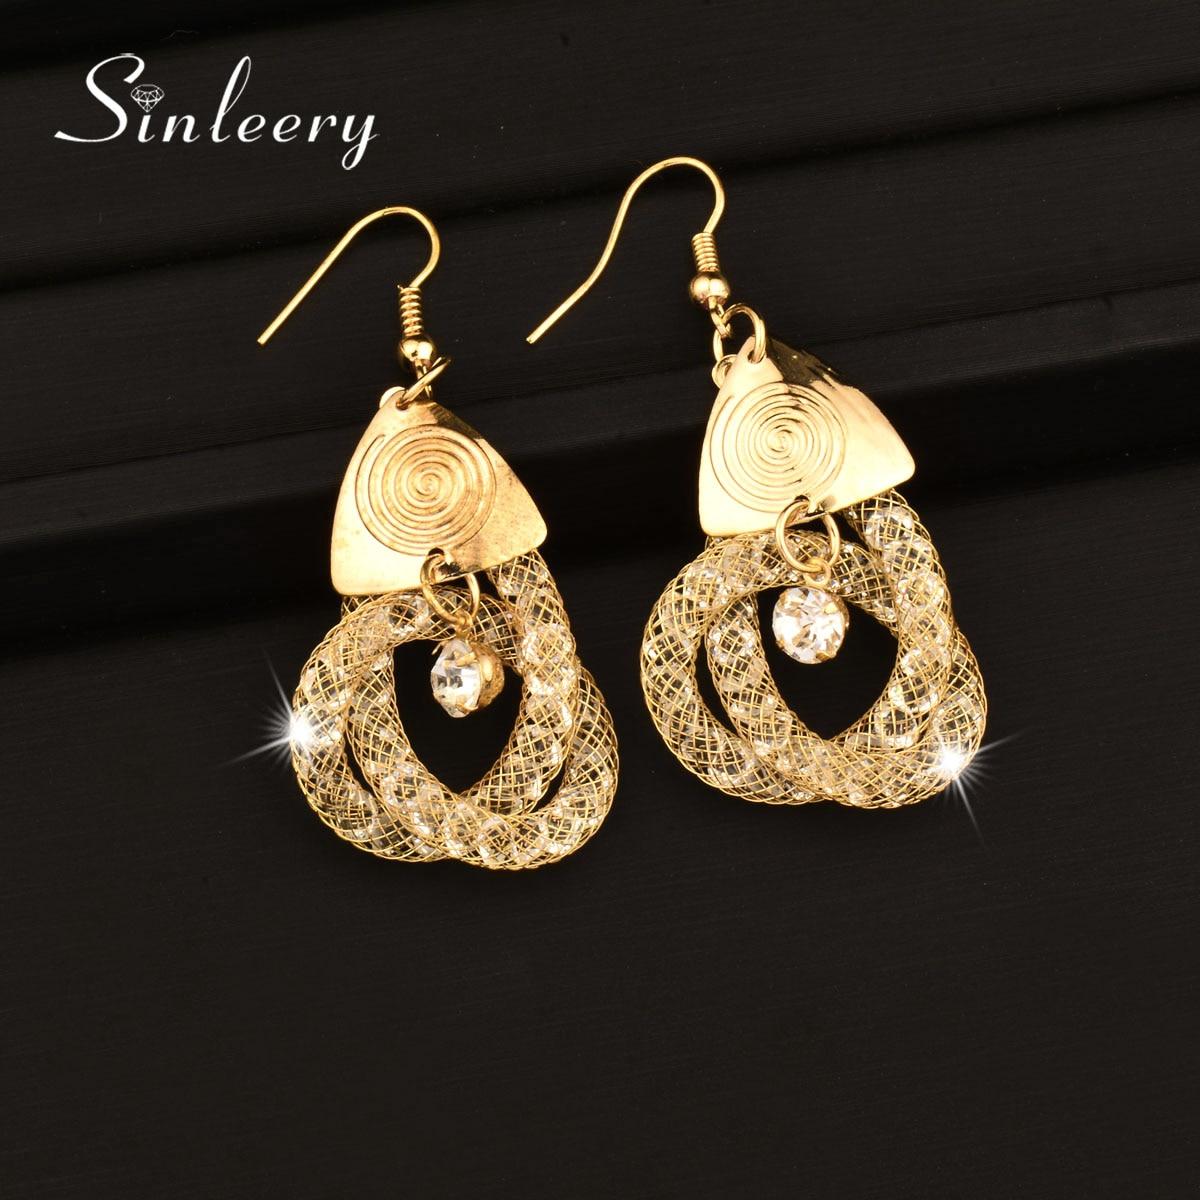 Sinleery Fashion Mesh Rhinestone Inside Knot Shaped Earrings Gold Color  Long Dangle Earrings African Jewelry Es095